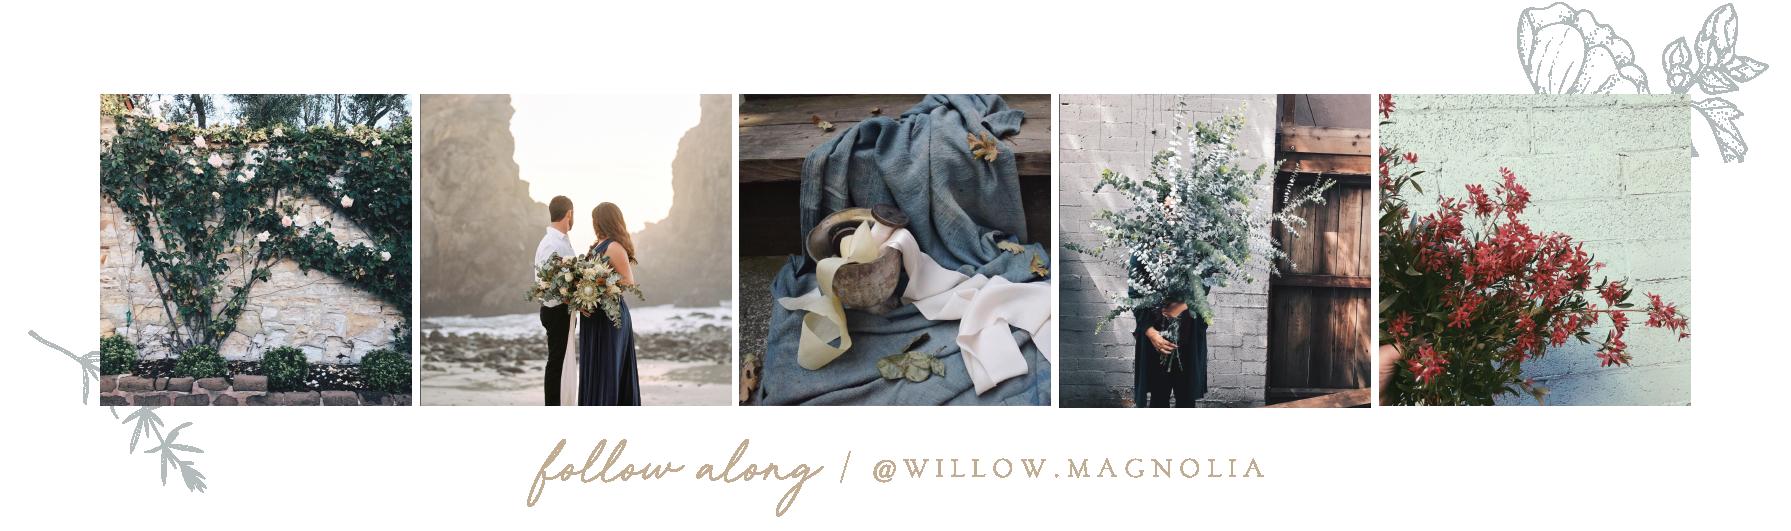 Willow & Magnolia IG Follow-10.png